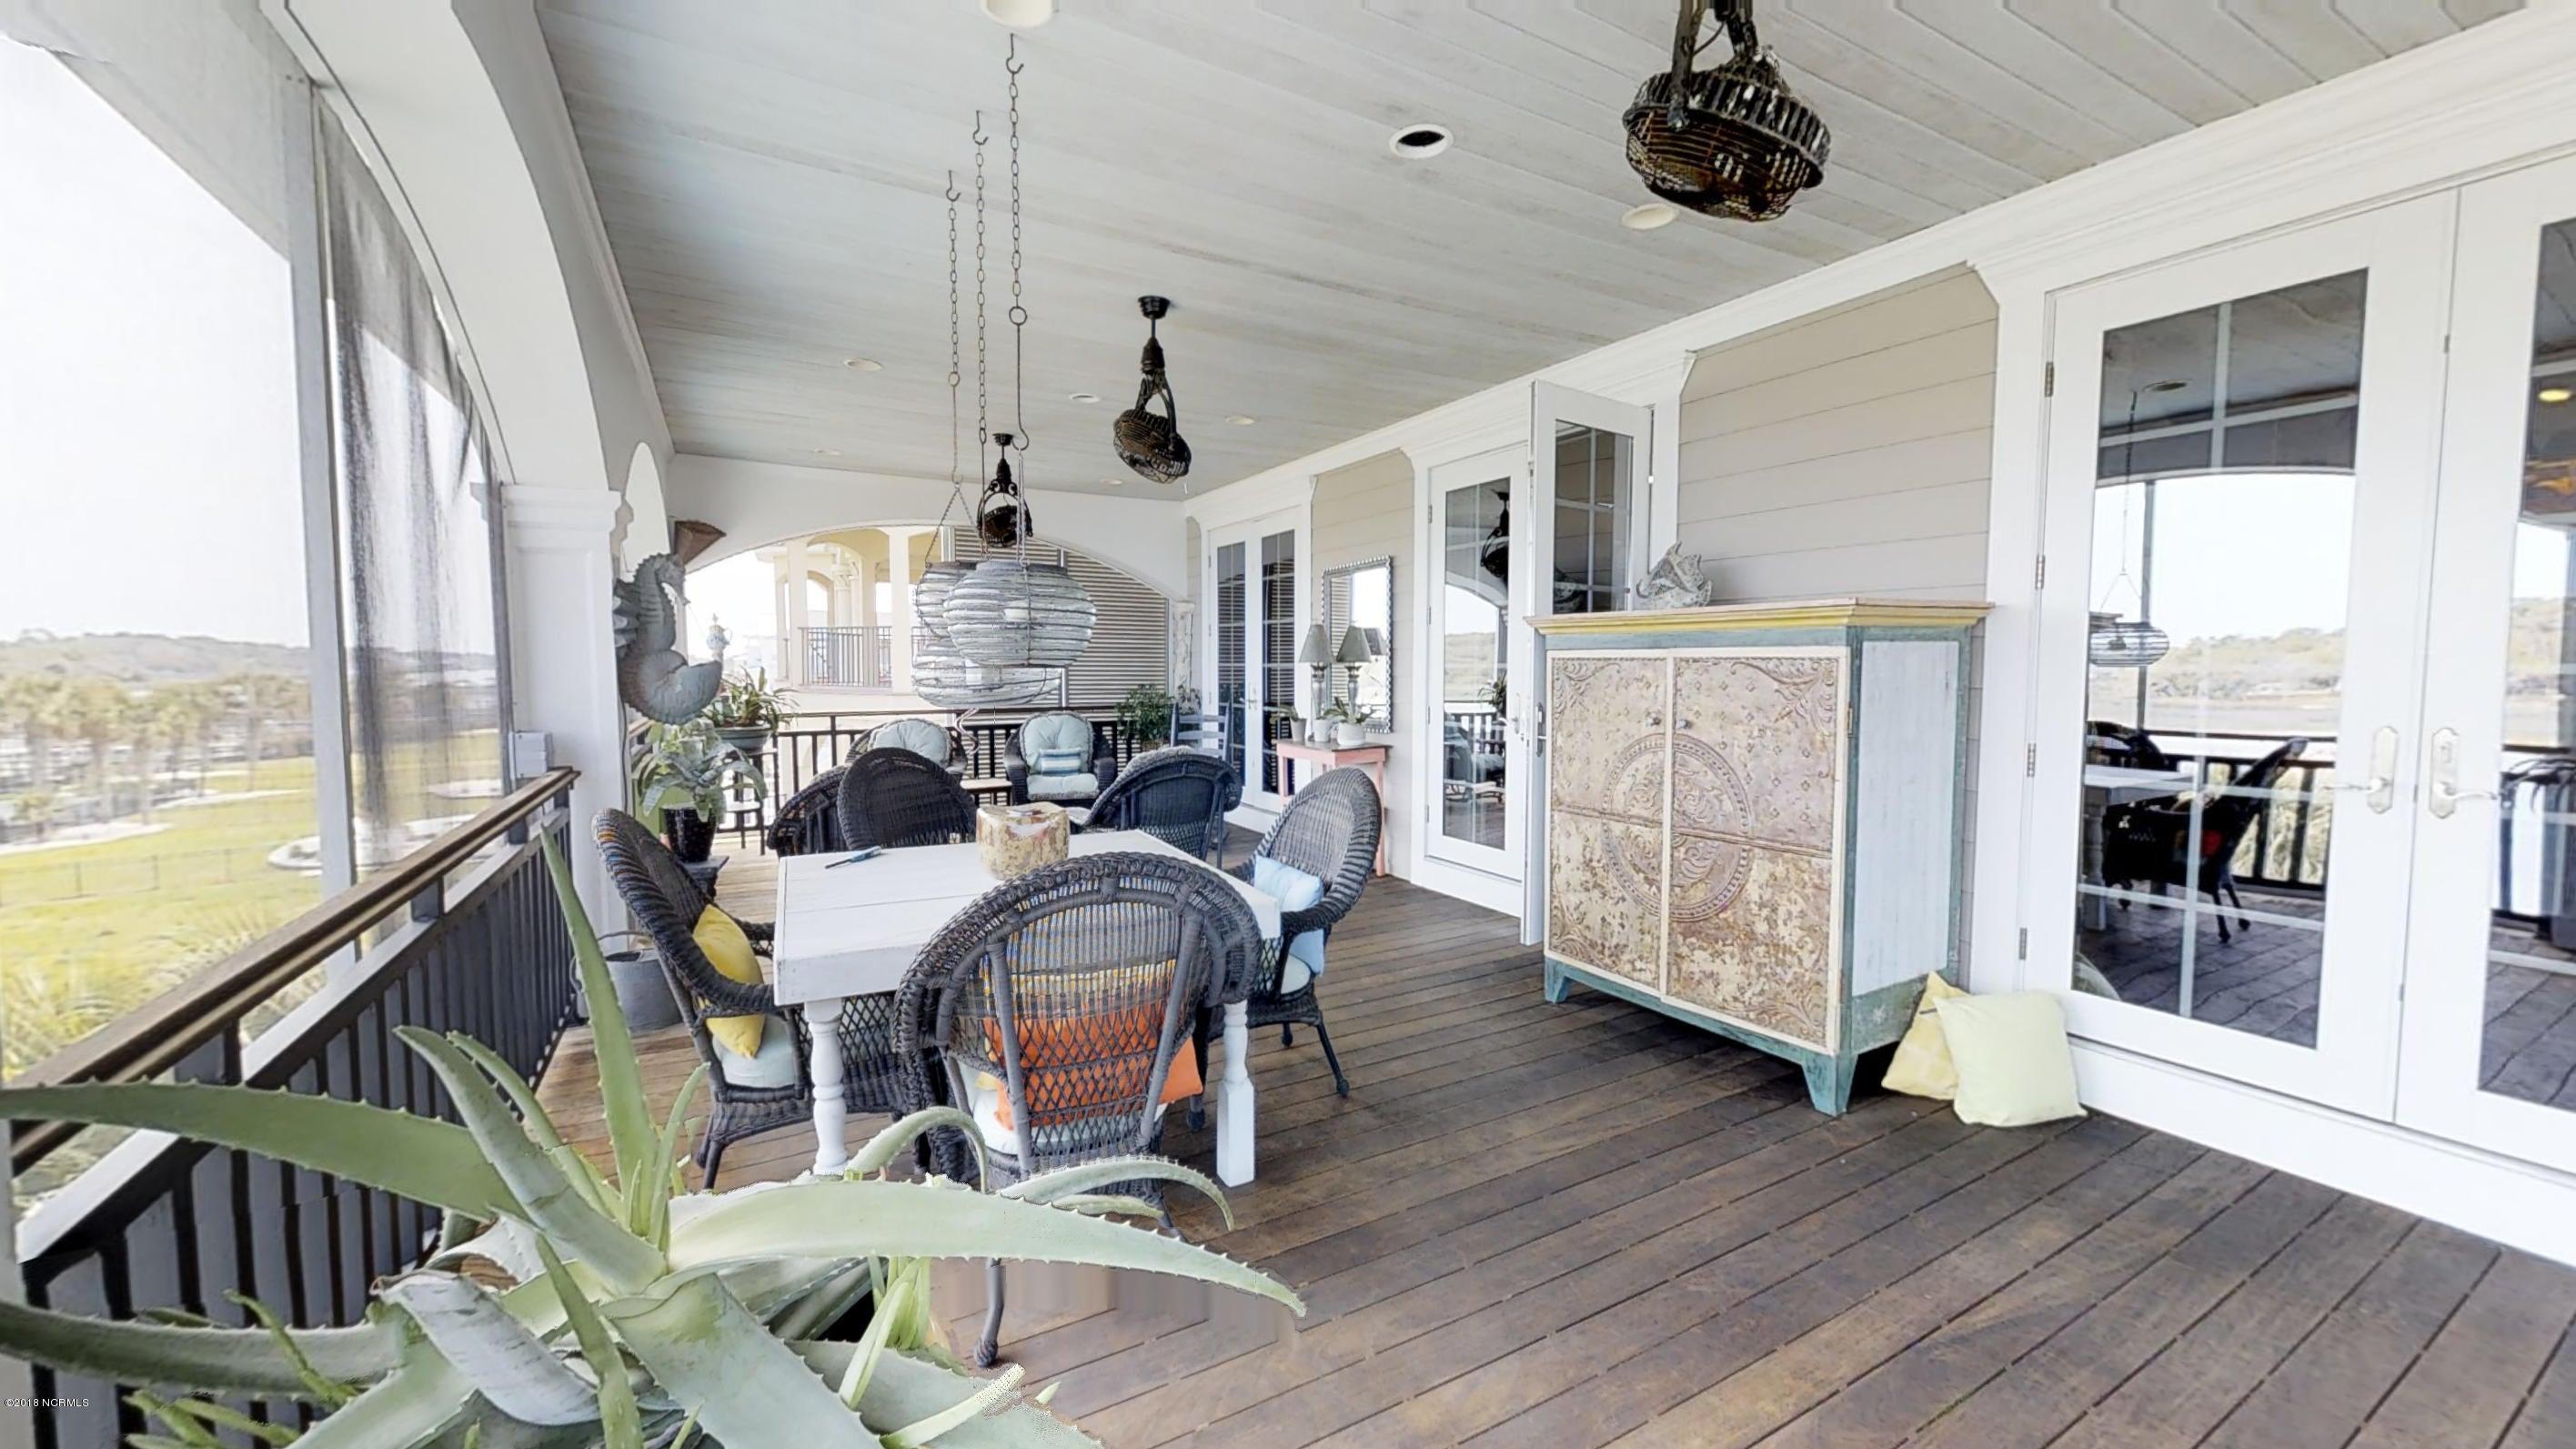 Ocean Isle Beach Real Estate - http://cdn.resize.sparkplatform.com/ncr/1024x768/true/20180414120136115964000000-o.jpg